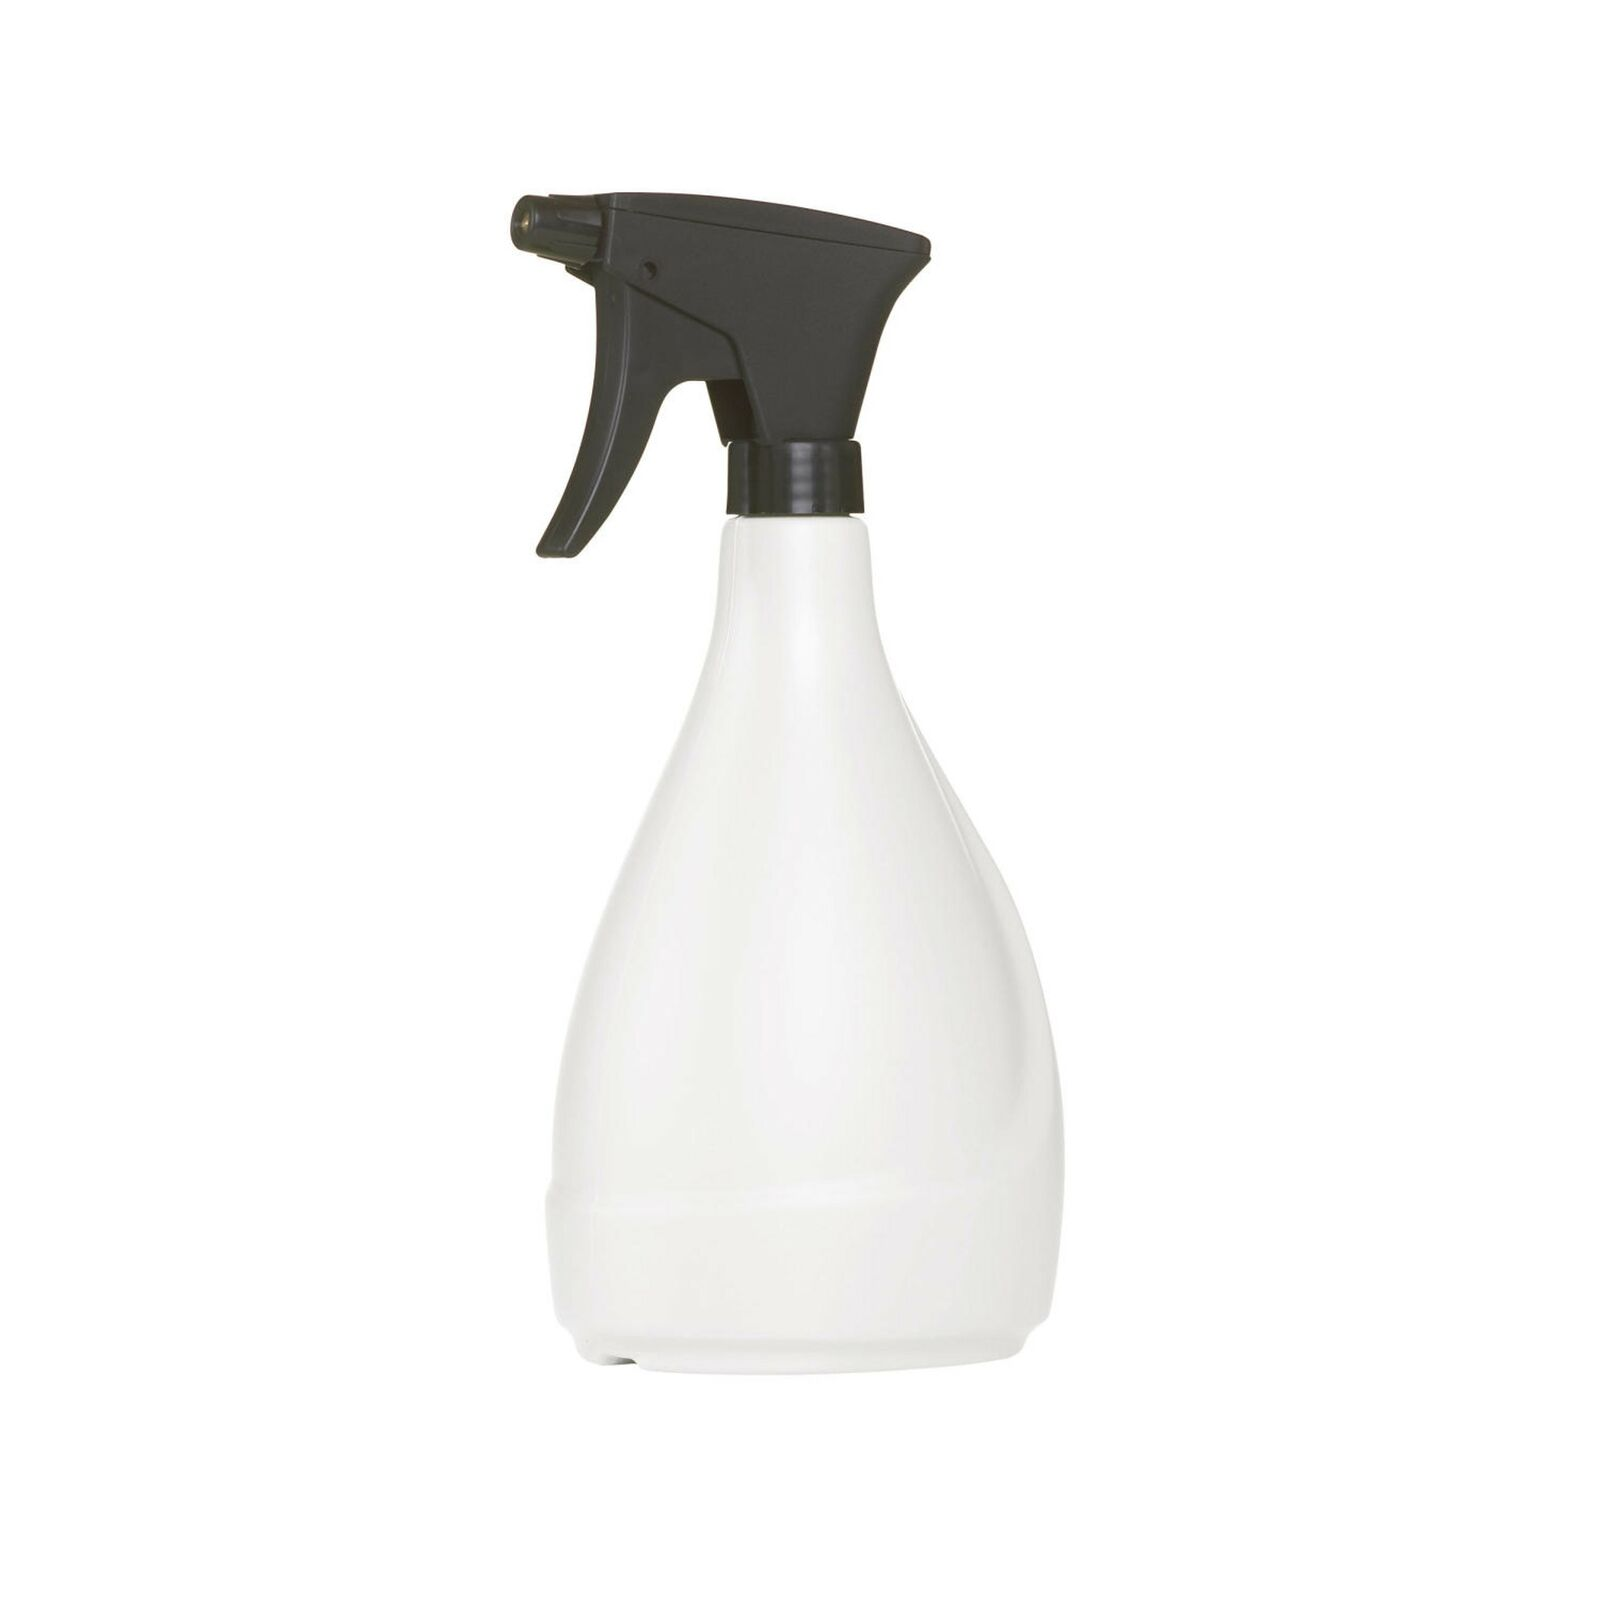 Emsa Oasis Sprayer Flowers Flower Sprayer Spray Bottle Water Sprayer On Off White 1 L